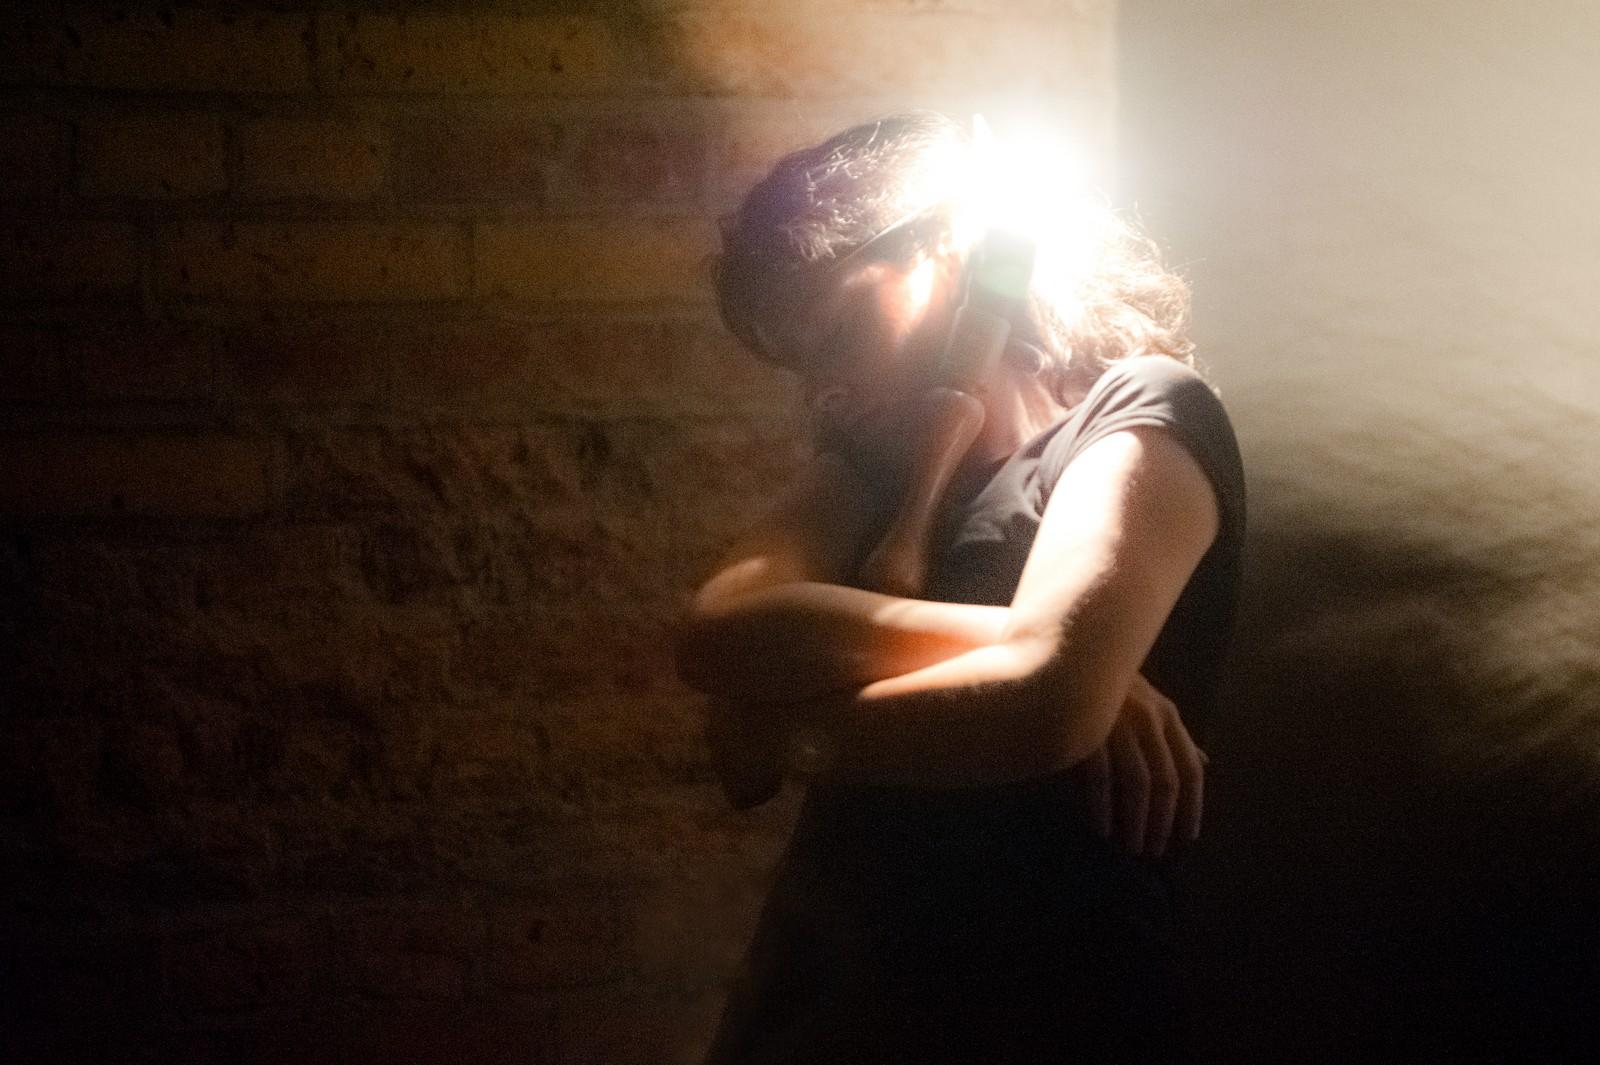 Niamh-Lynam Cotter, ATIS 2012 TRAP, photo Maciej Zakrzewski